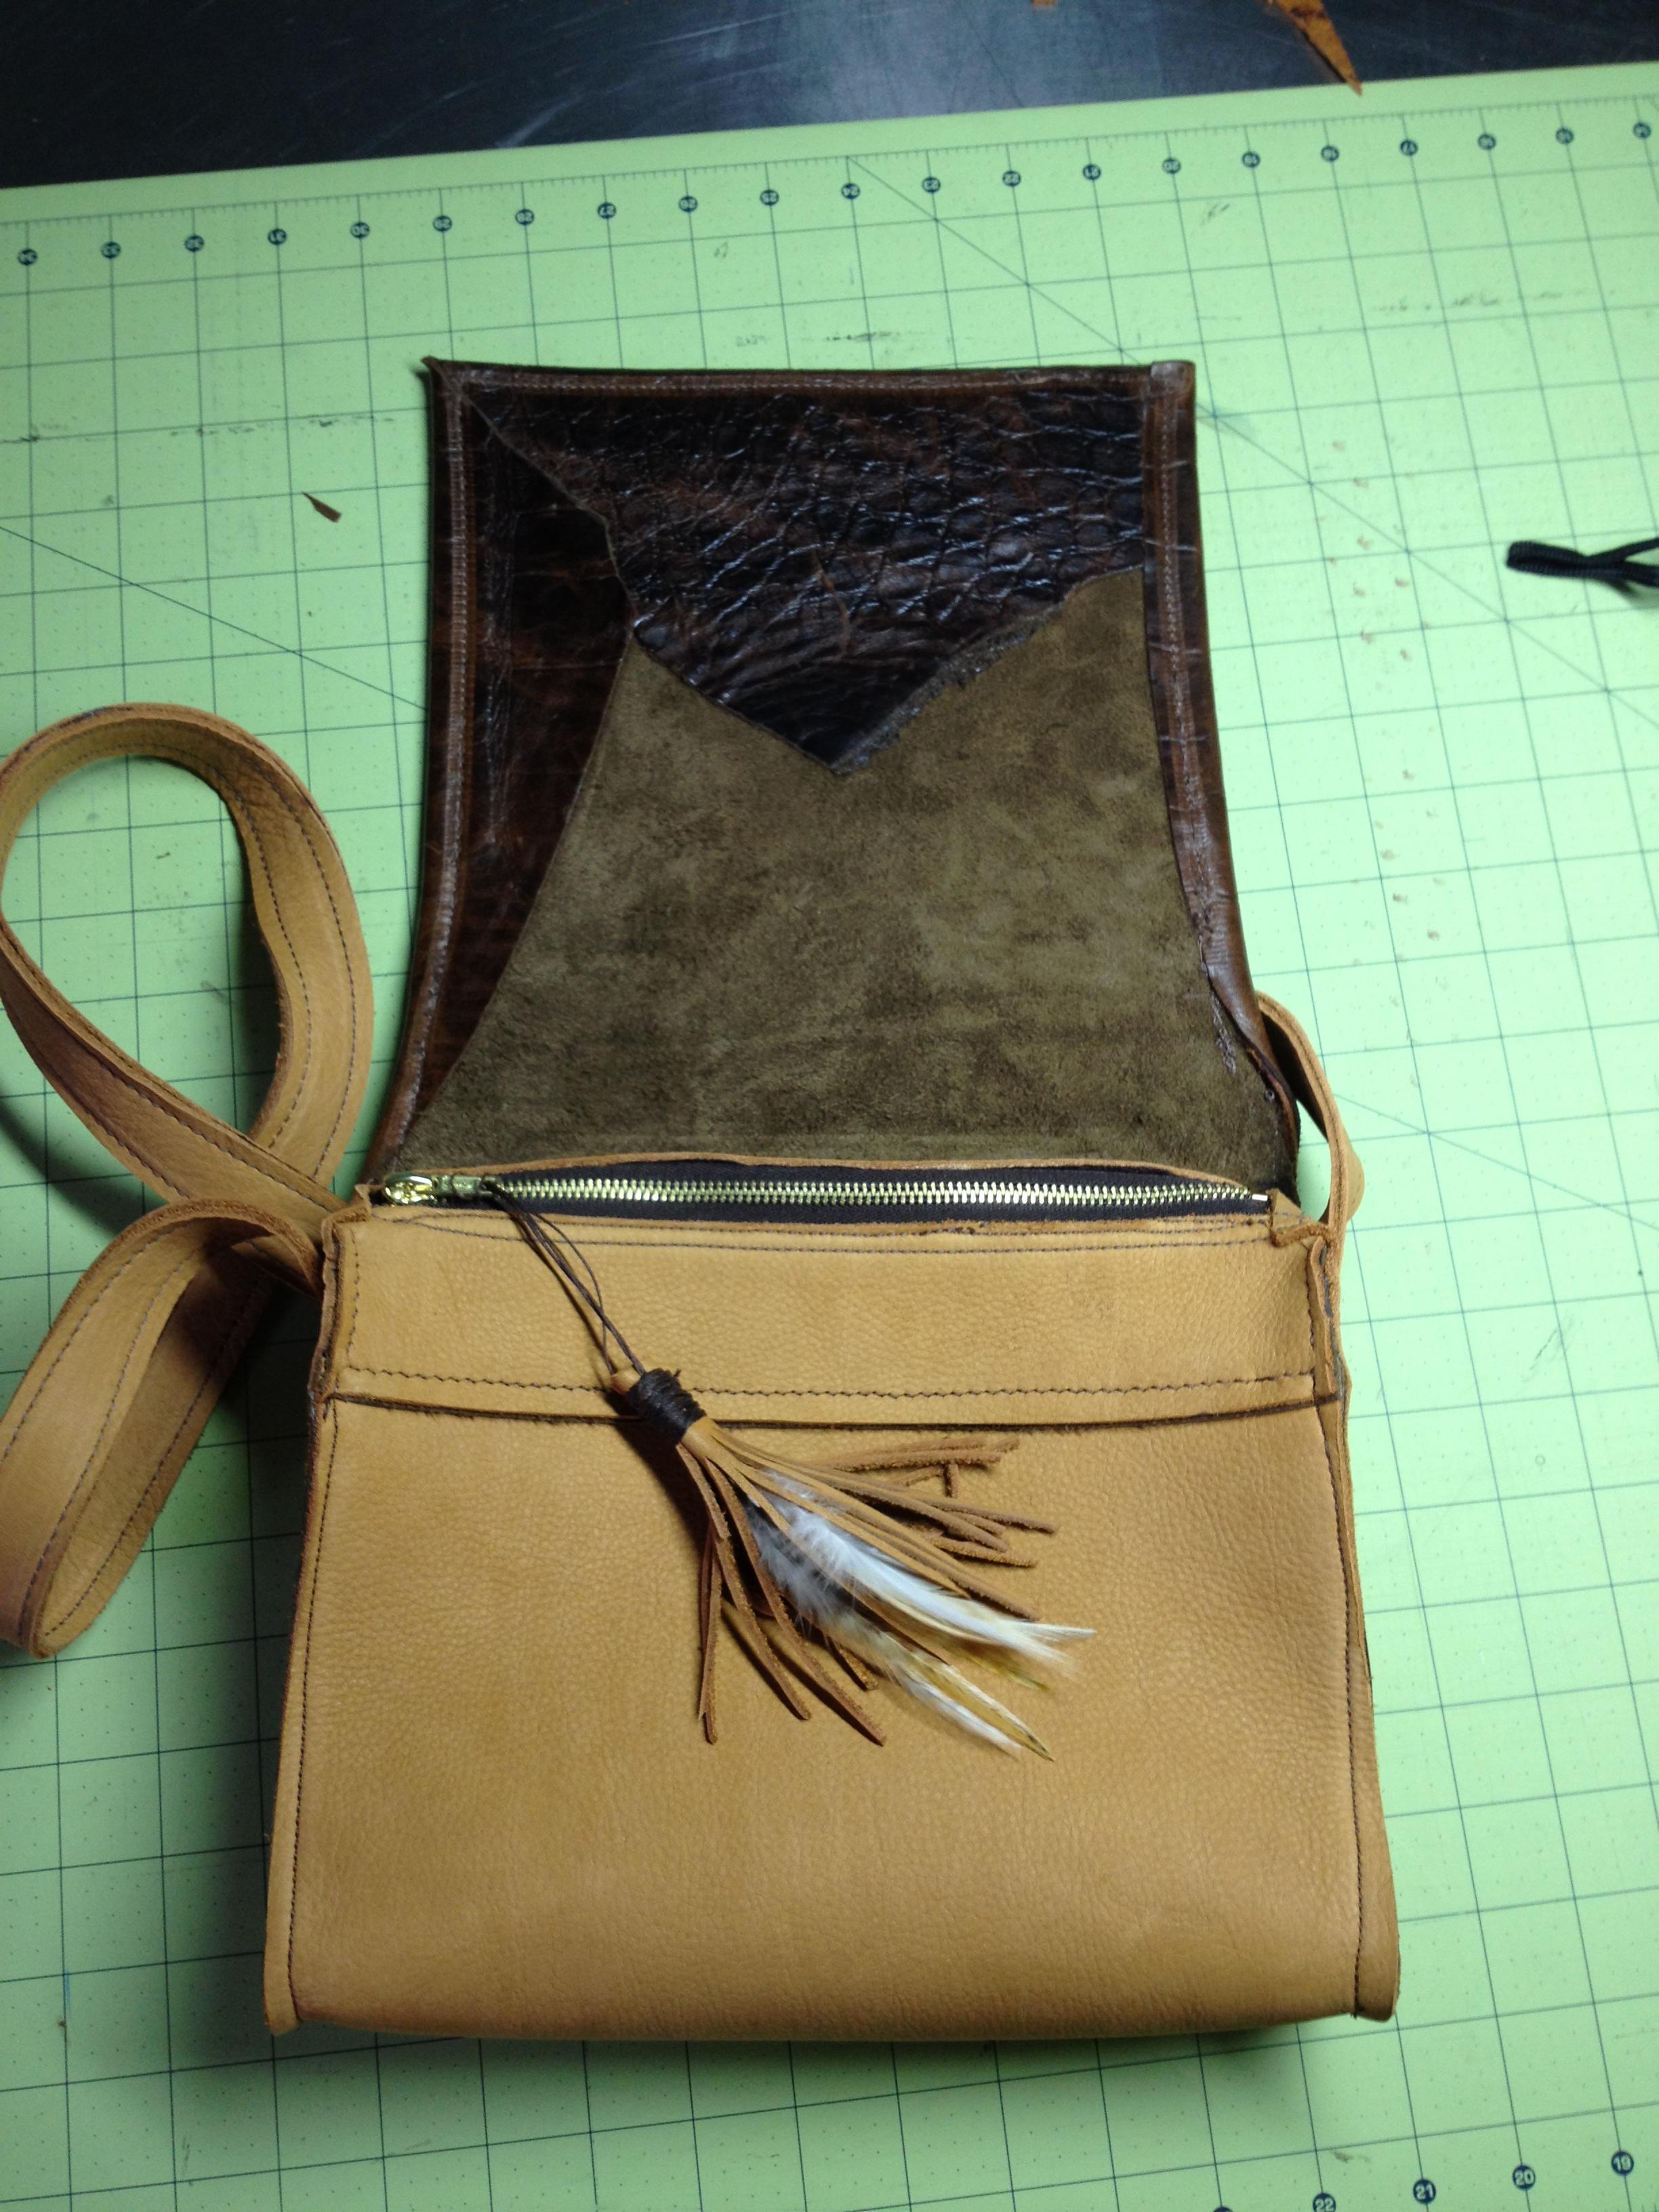 The Carolina Handbag-flap opened